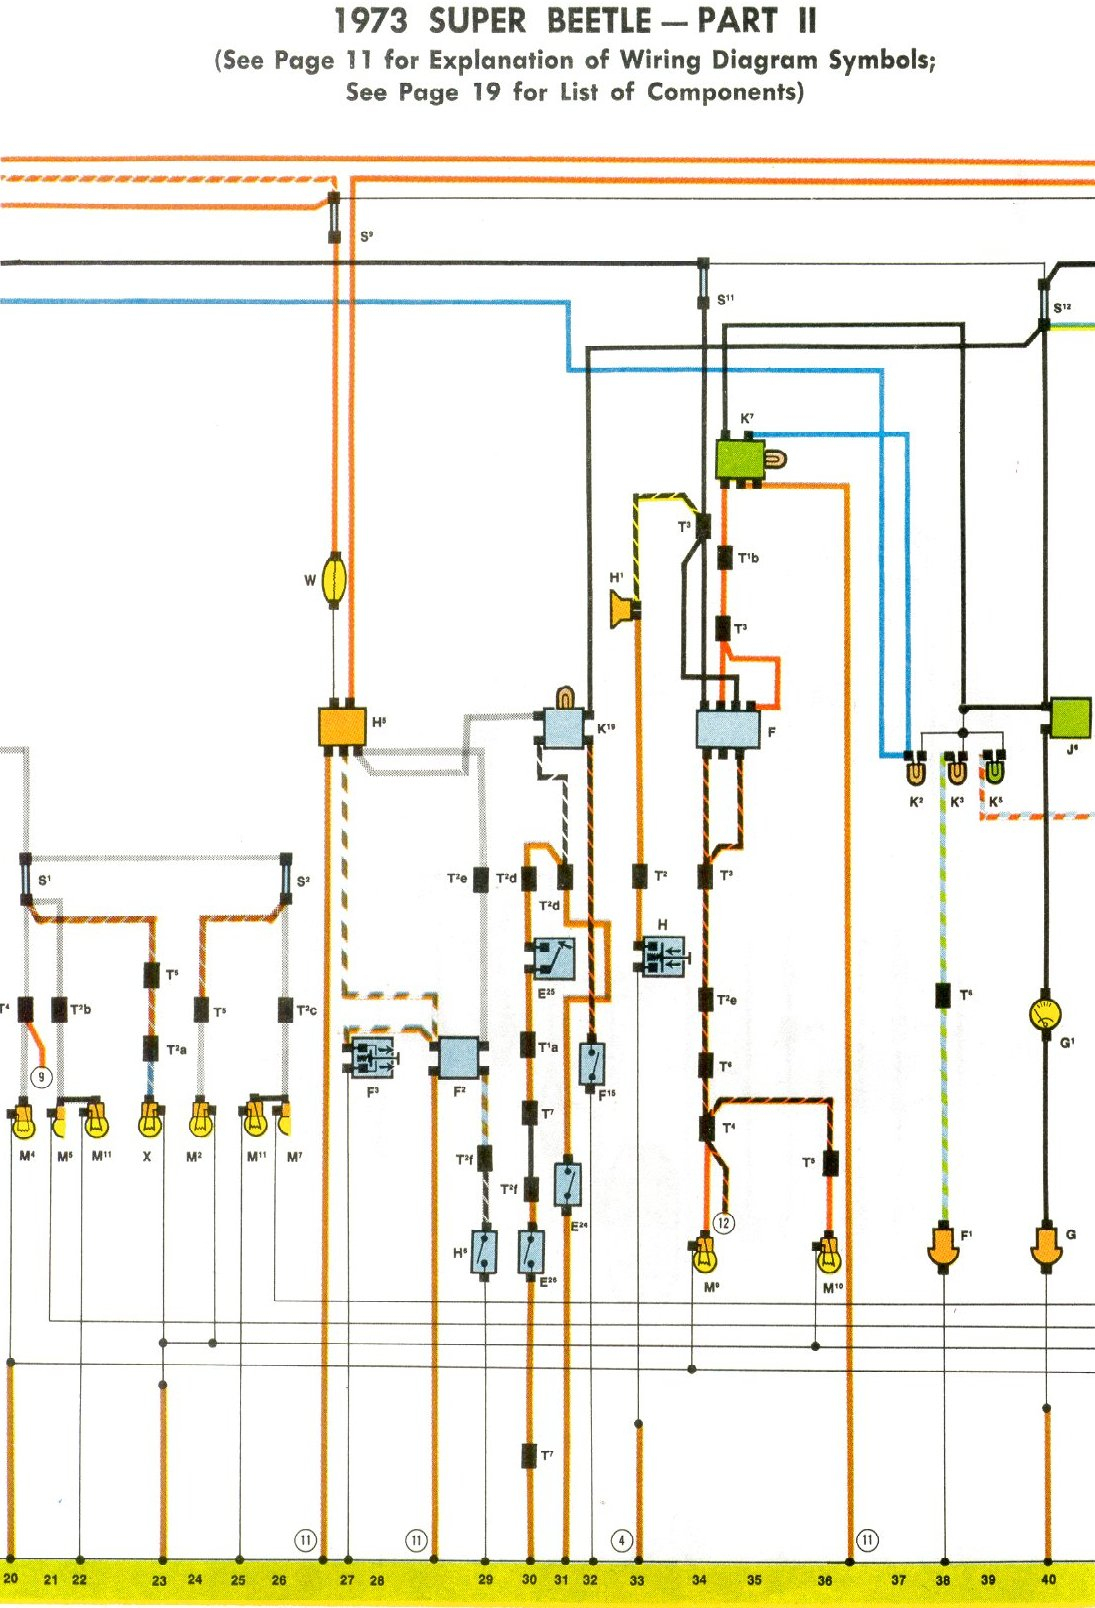 73 Vw Wiring Diagram - Data Wiring Diagram Schematic - 1973 Vw Beetle Wiring Diagram